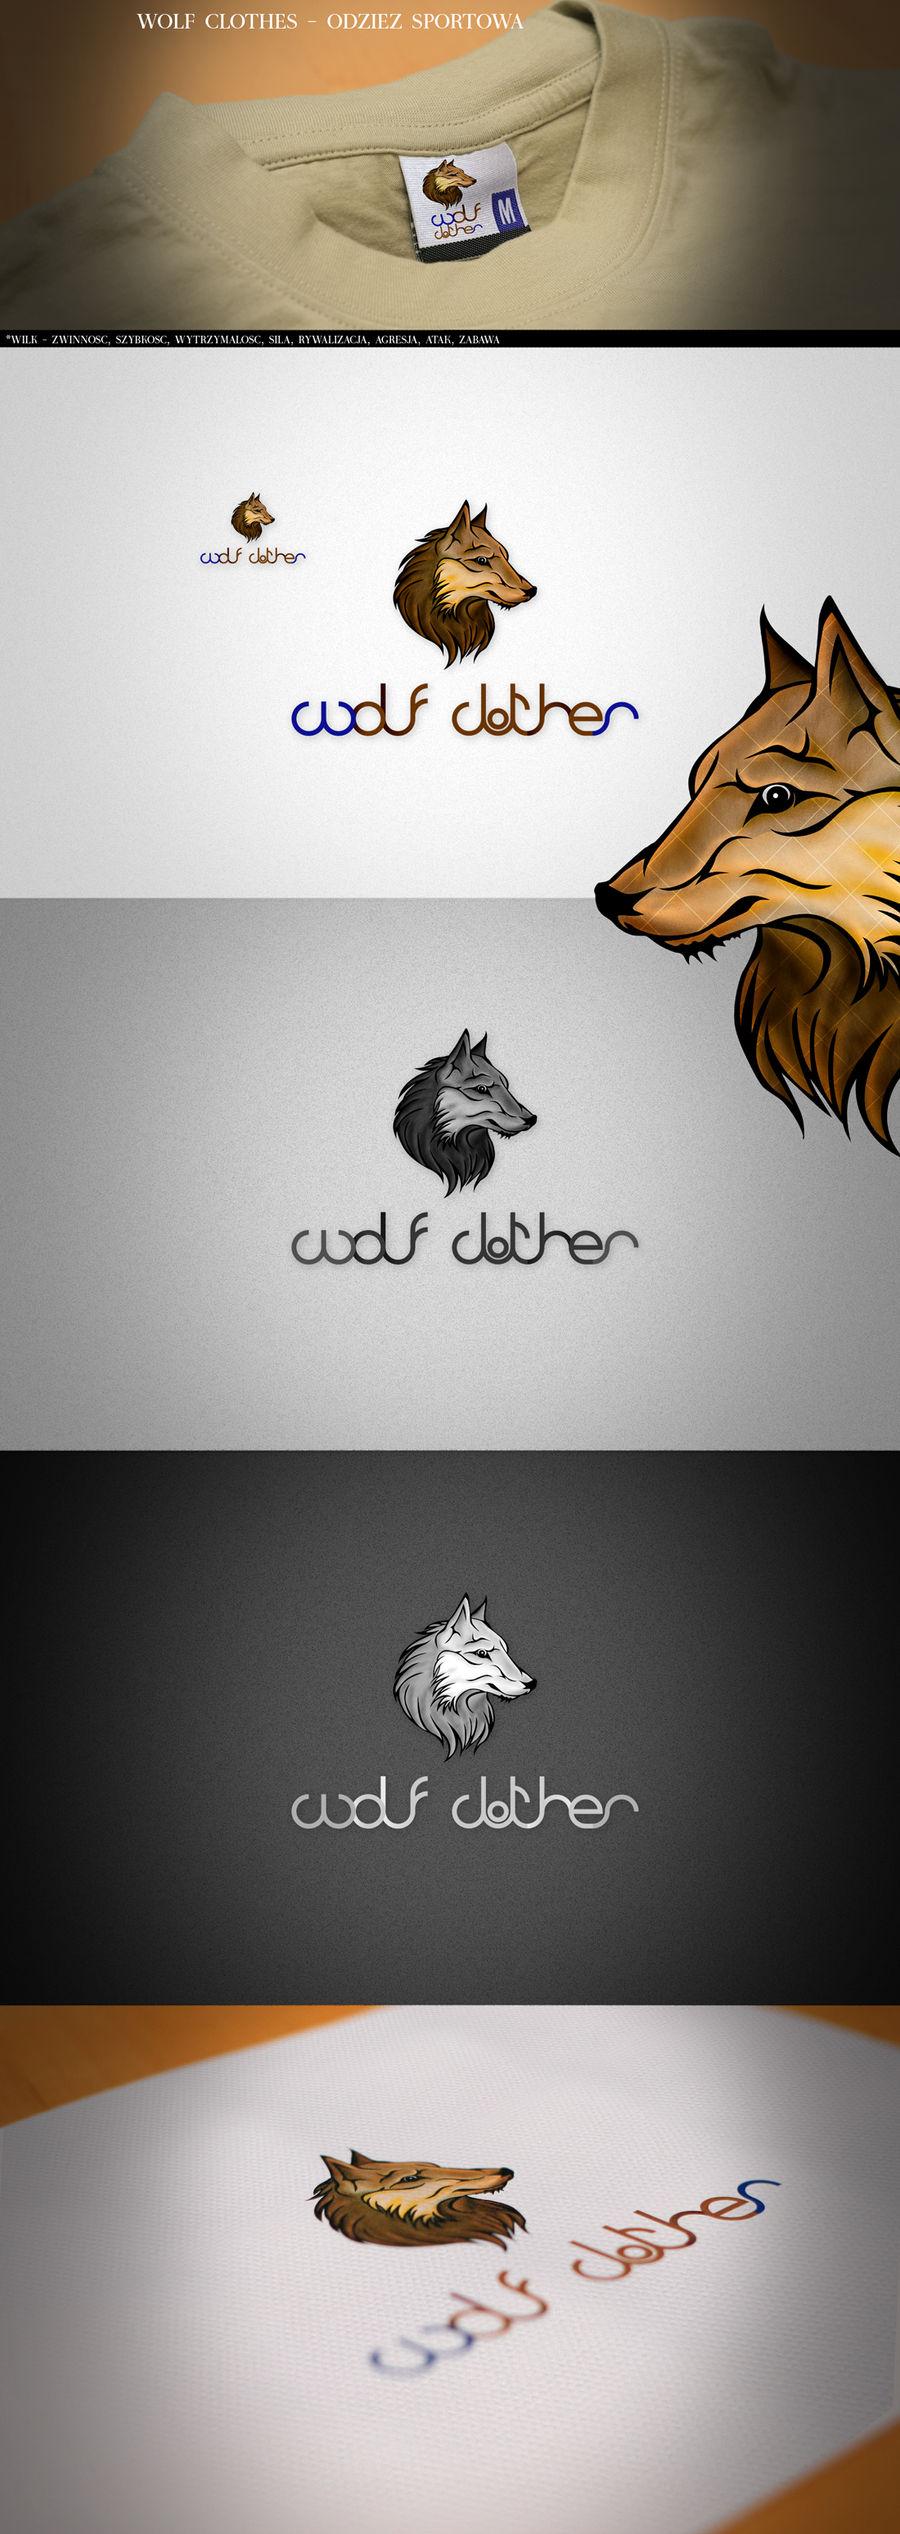 Wolf clothes by mprudlak